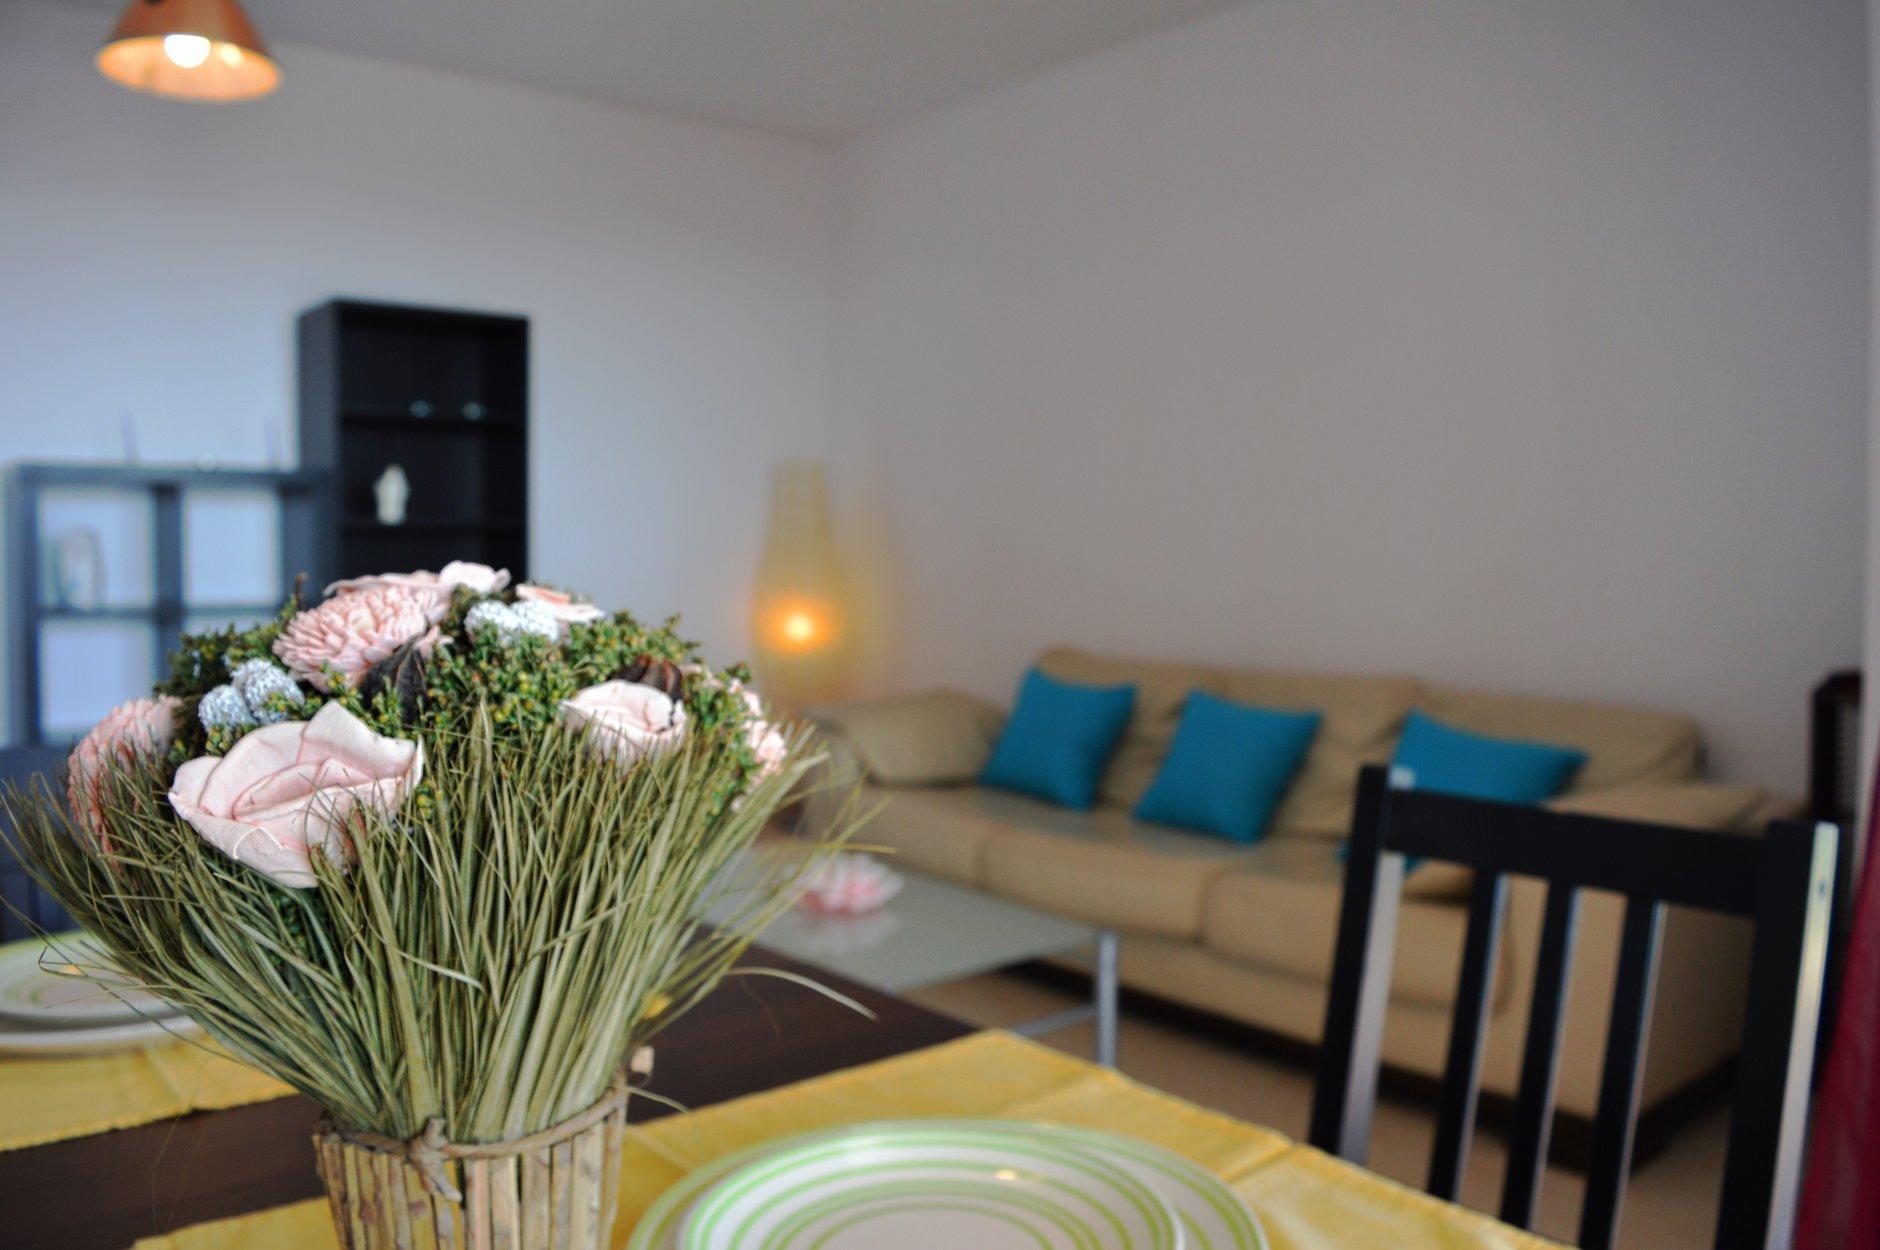 aaa2 Комнатная Квартира в Mijas Golf, Mijas | M164737